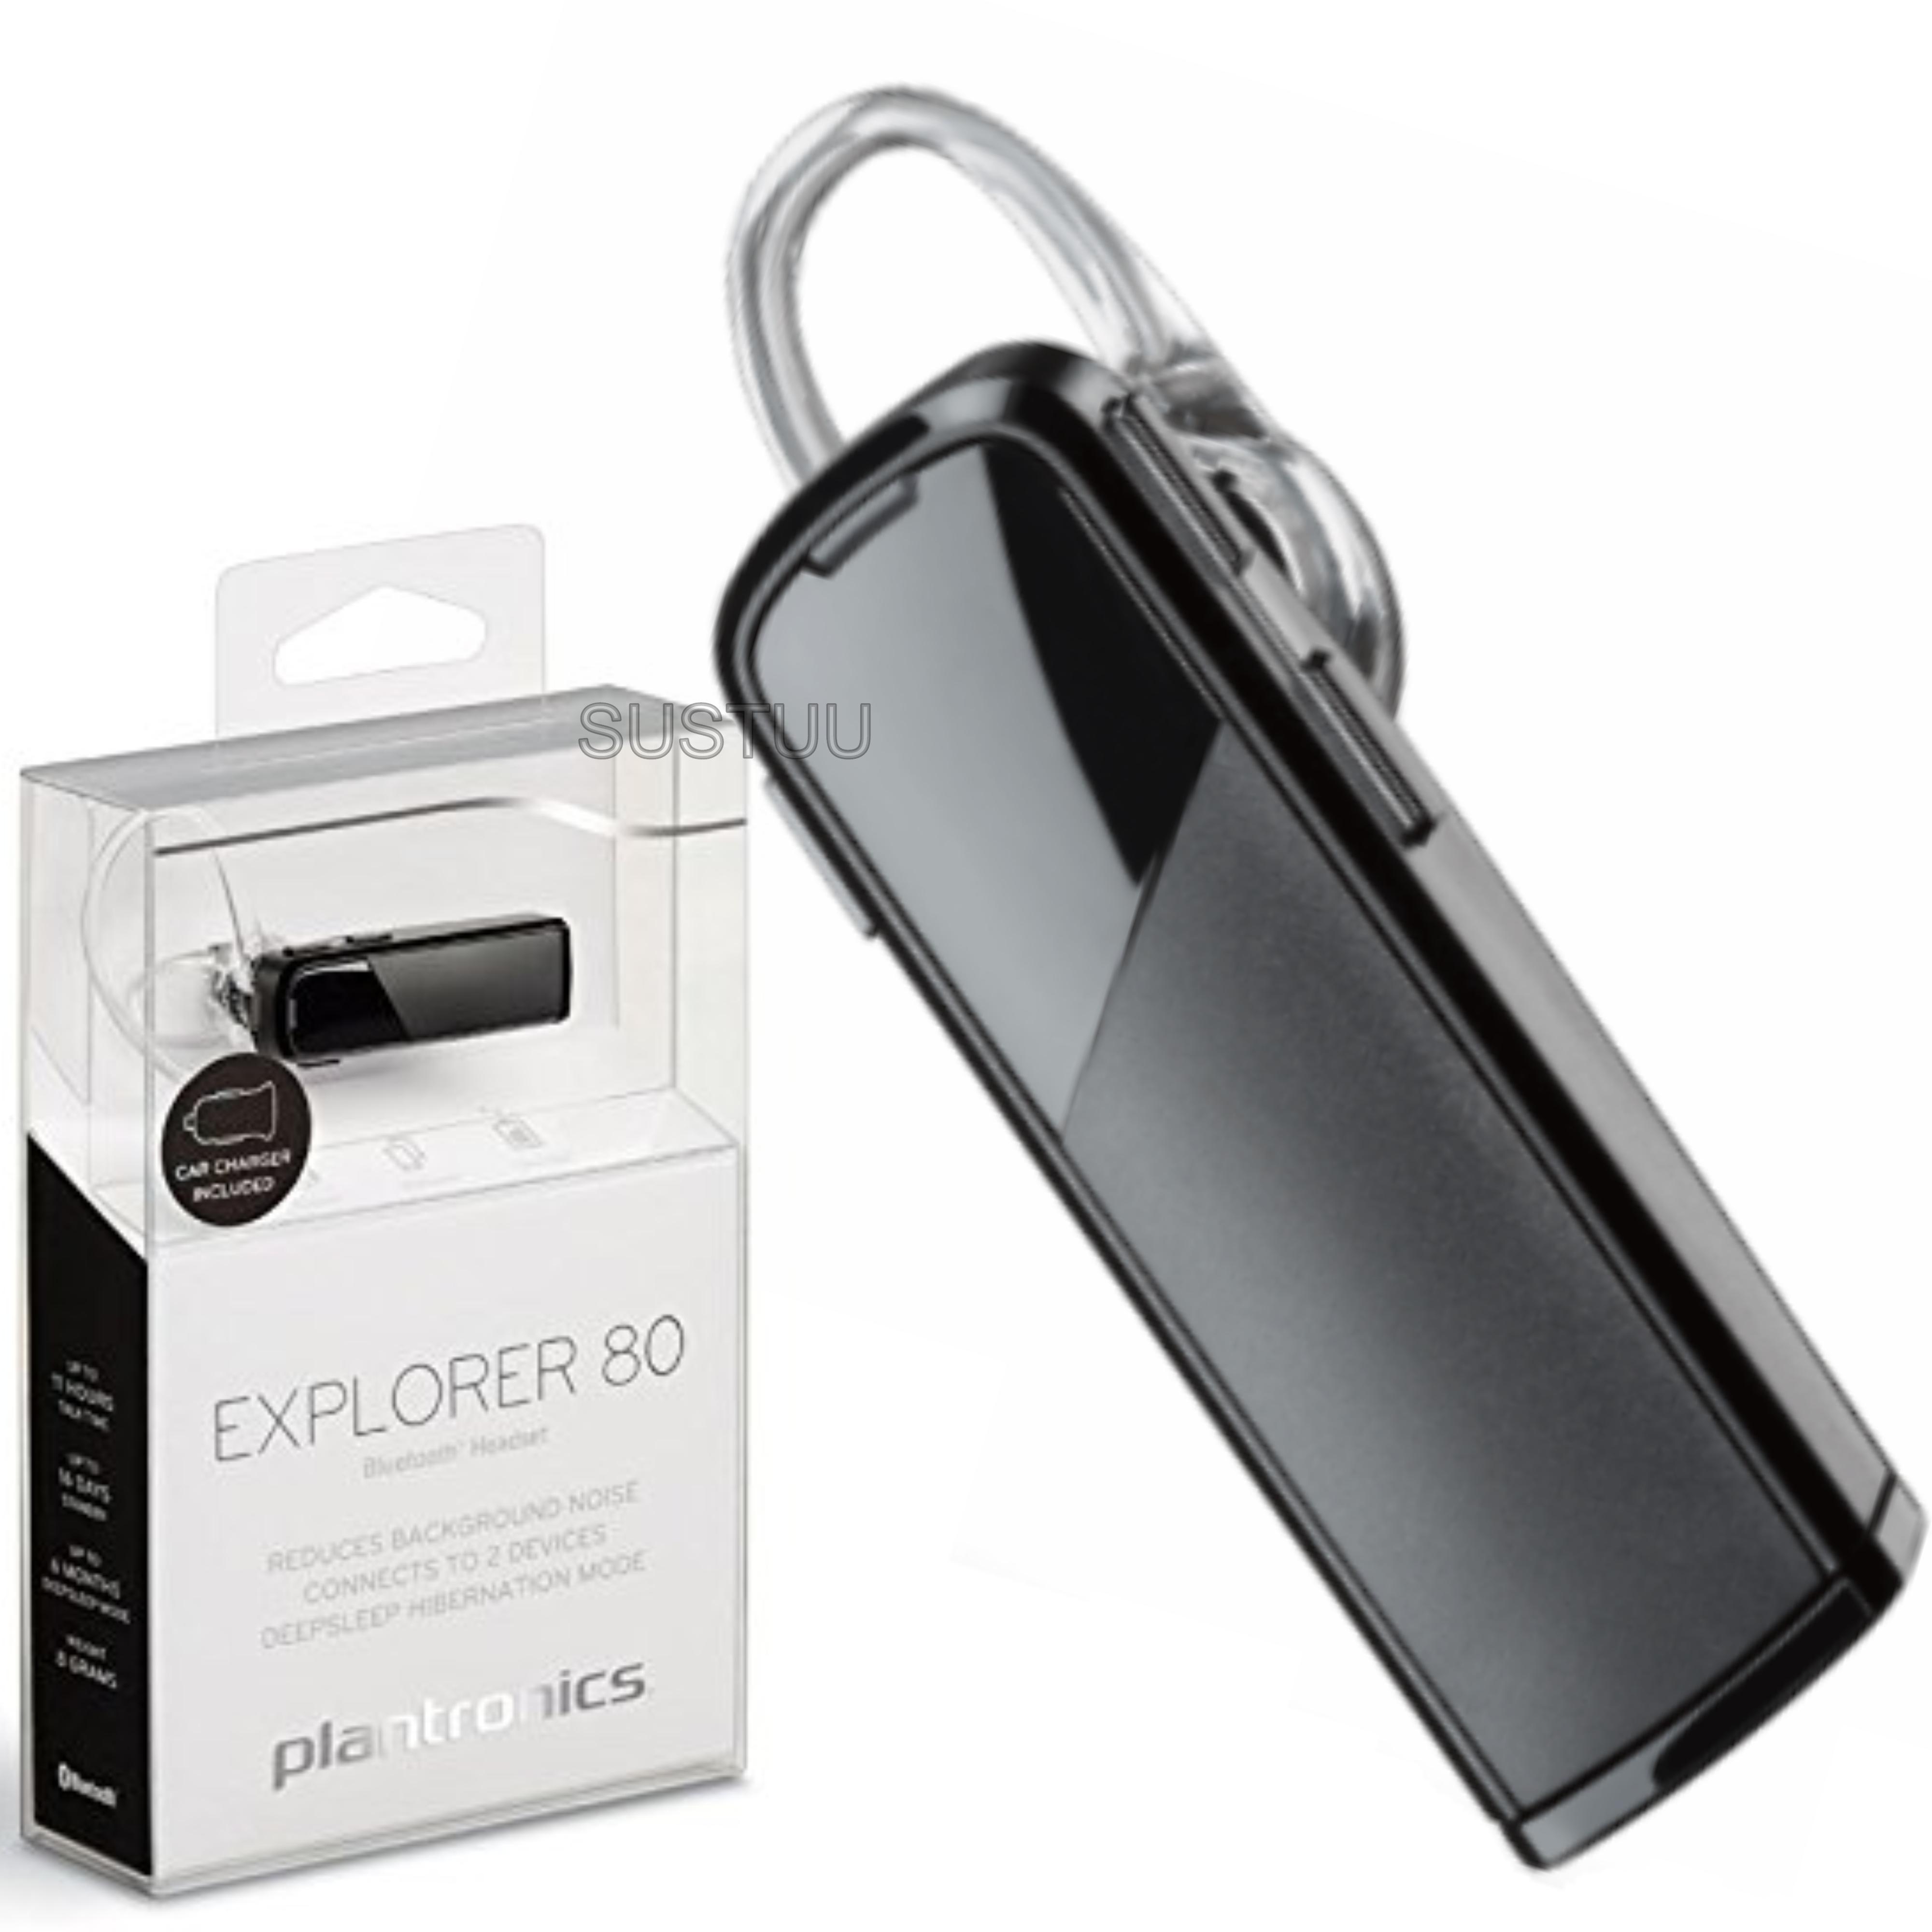 b80d194d18e Plantronics Explorer 80 Wireless Bluetooth Headset | Mobile Phone  Hands-free Calls | Sustuu